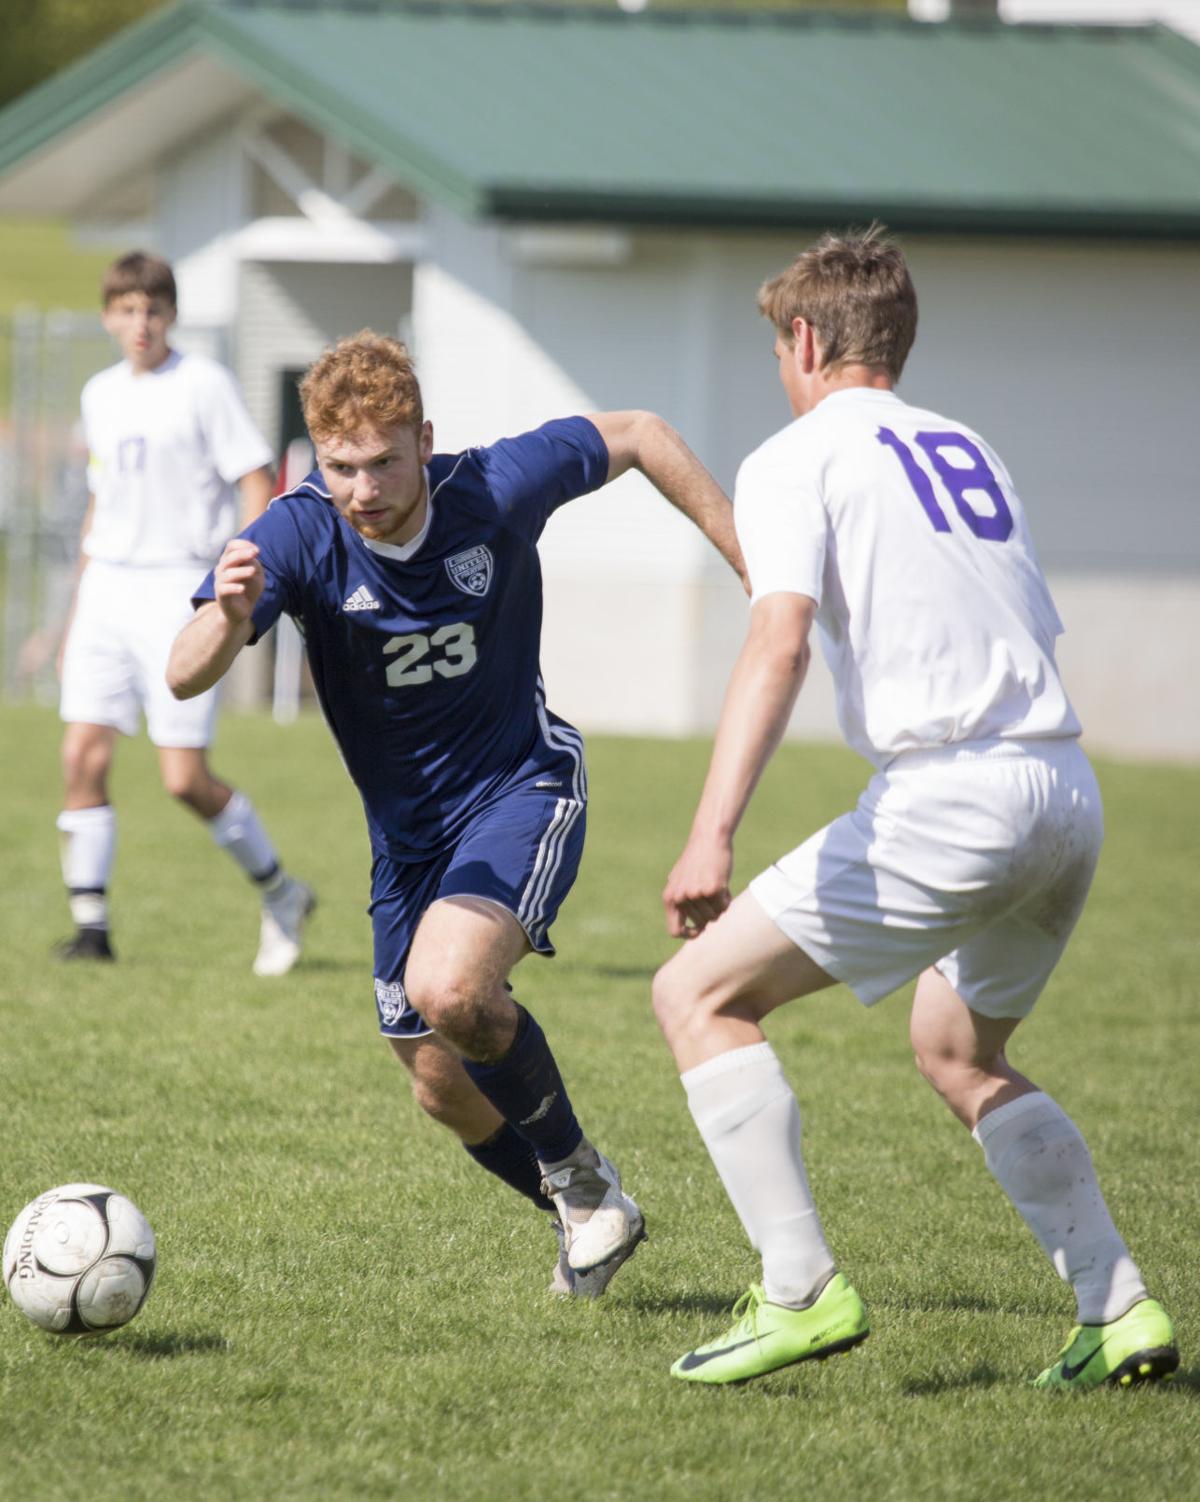 050419kw-soccer-tournament-04